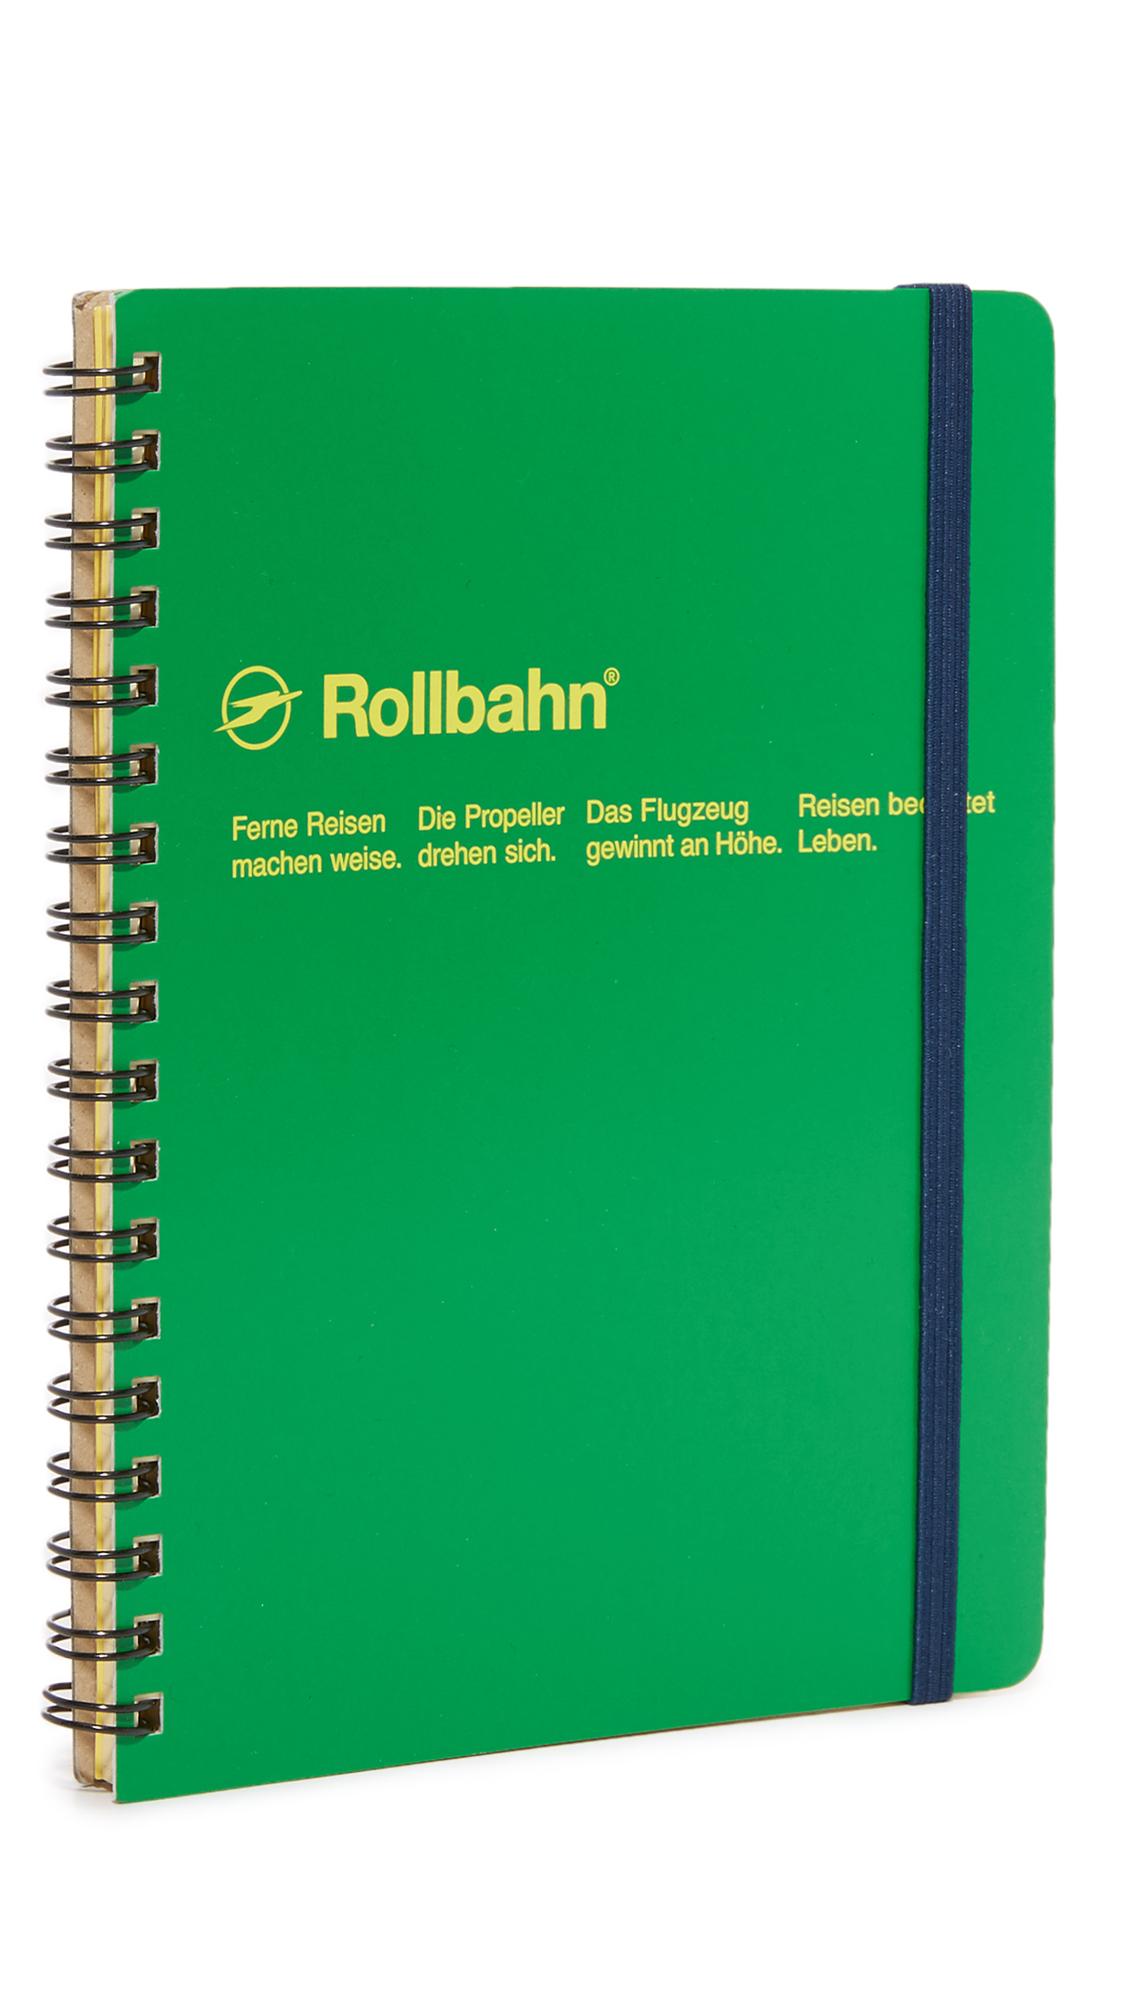 DELFONICS Rollbahn Spiral Notebook in Forest Green